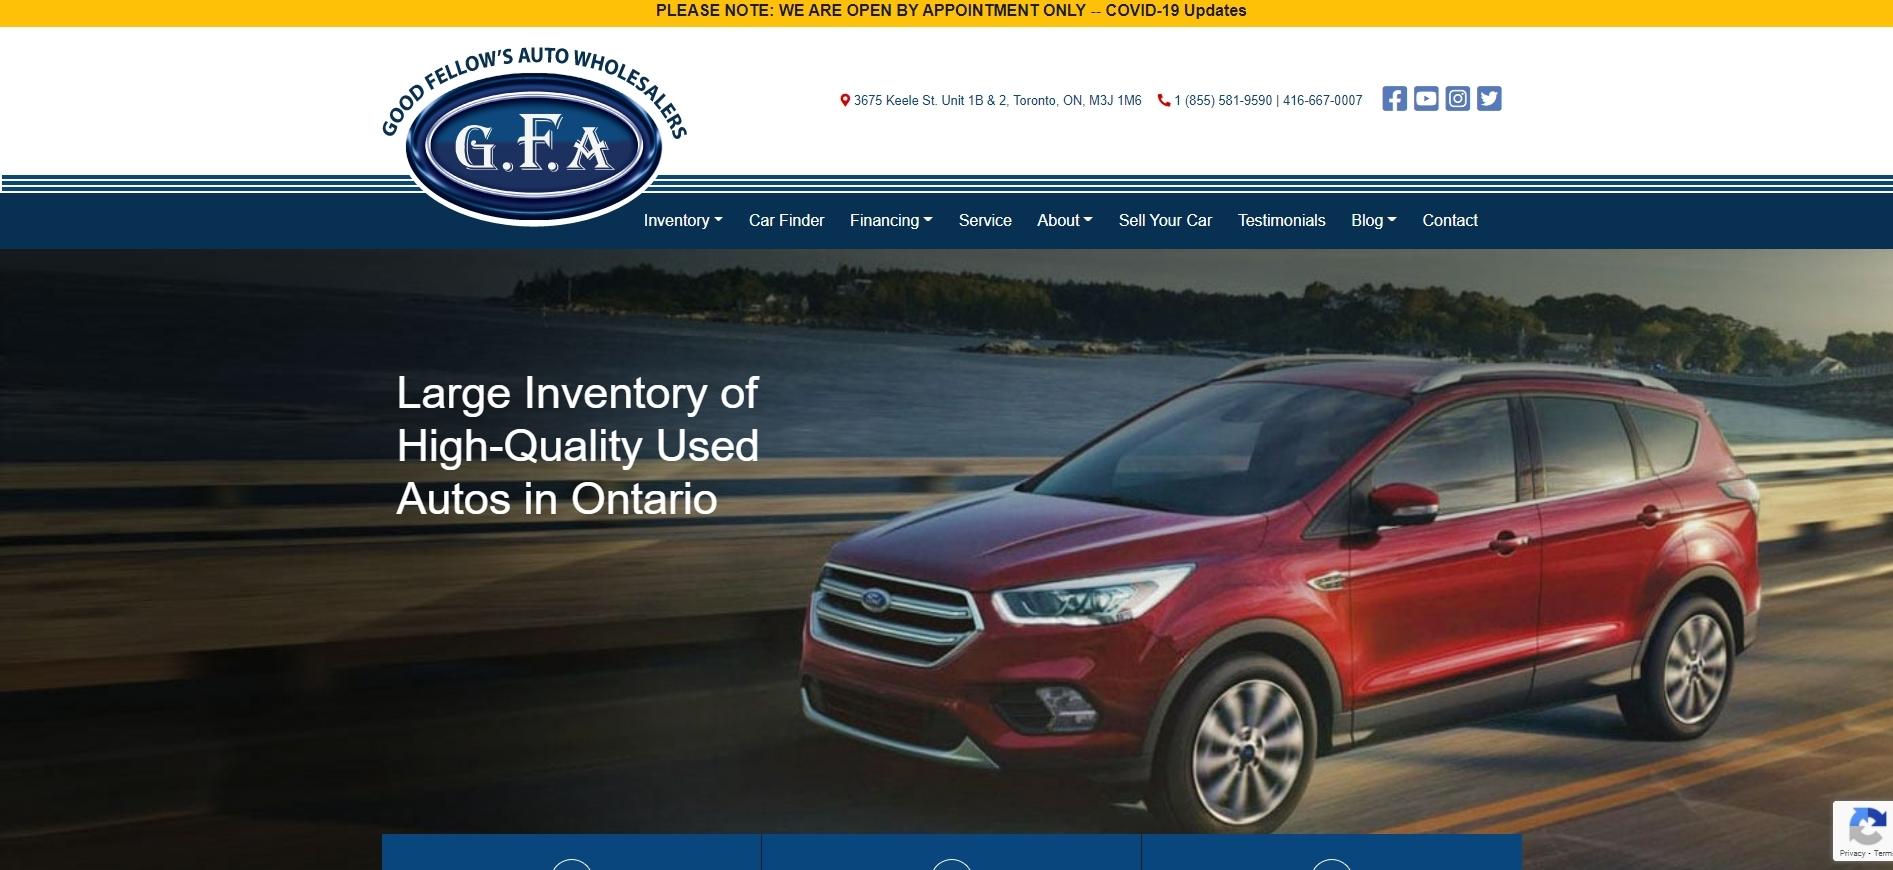 Good Fellows Auto wholesalers